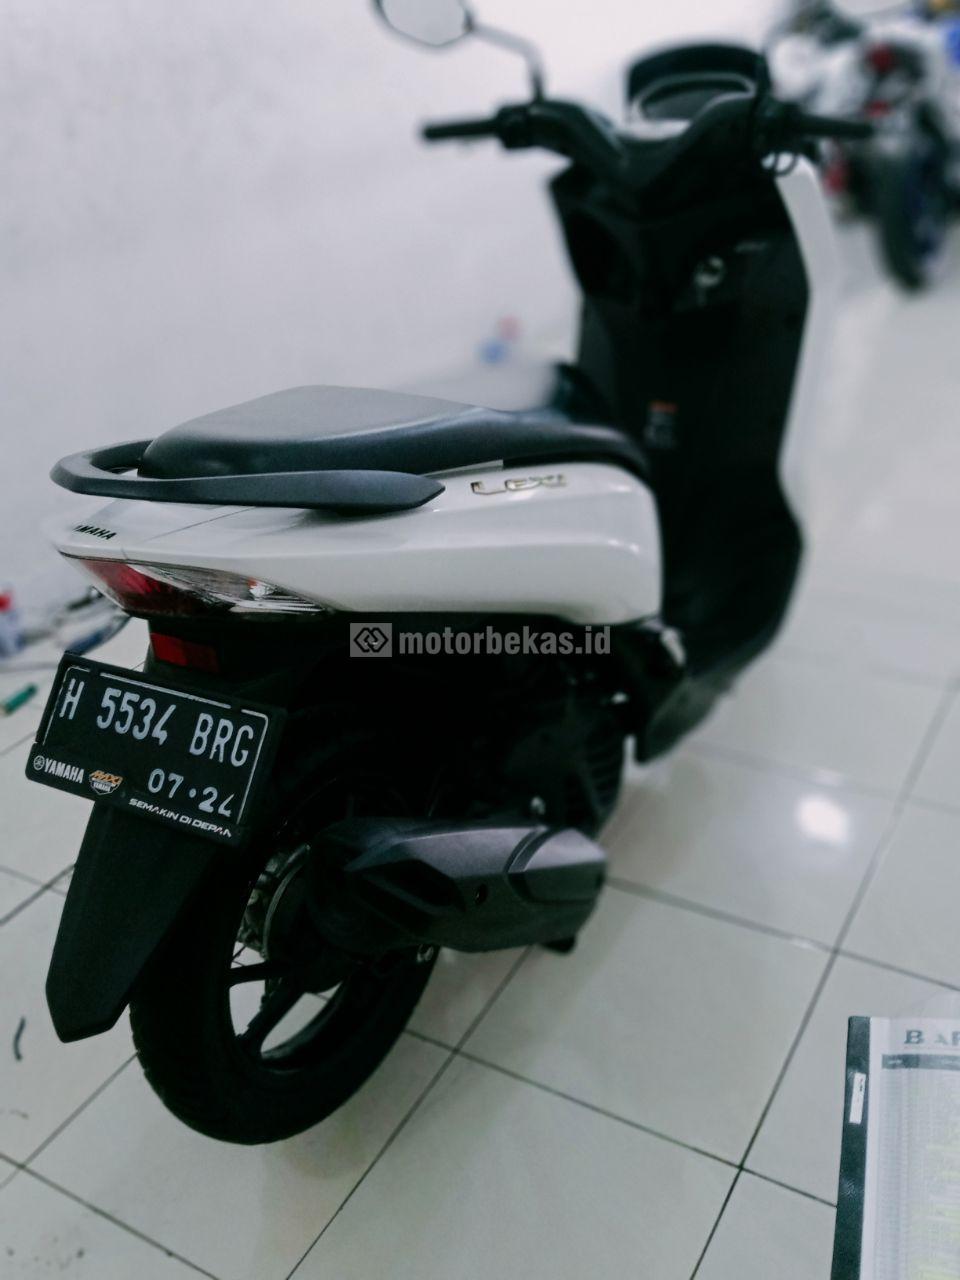 YAMAHA LEXI FI 955 motorbekas.id